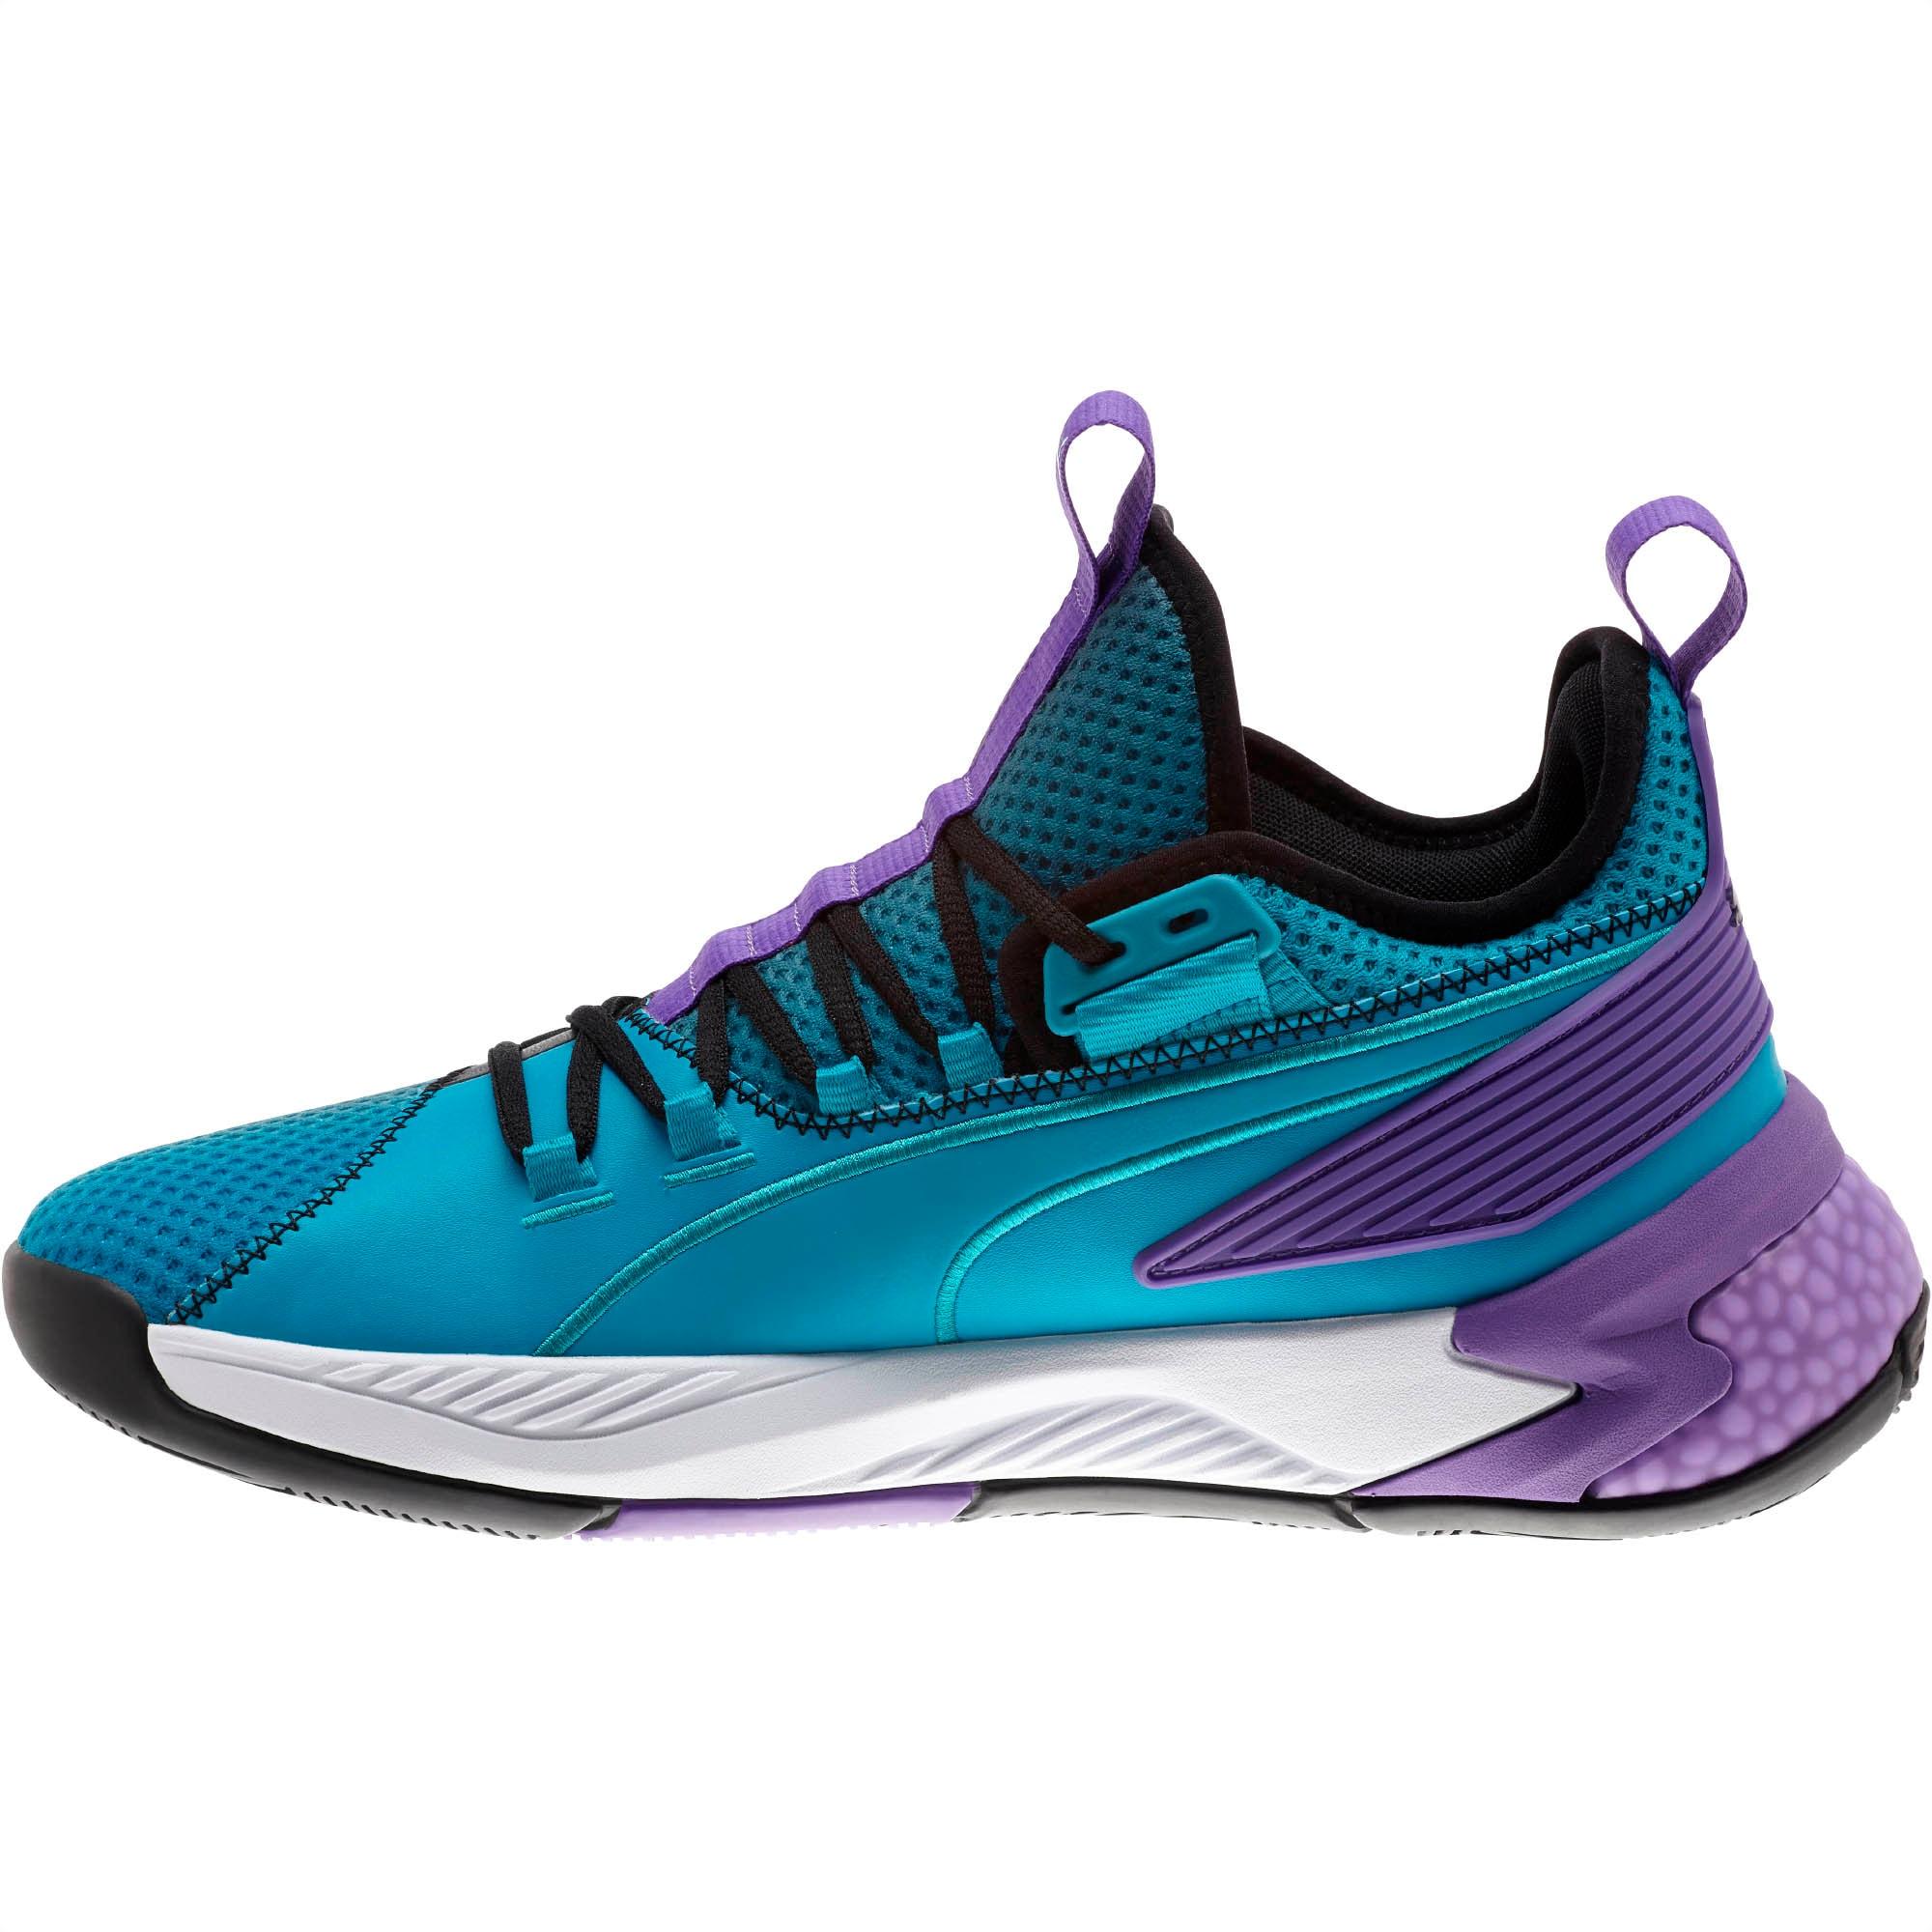 Uproar Fade Shoes ASG Charlotte Basketball knwNP8X0O